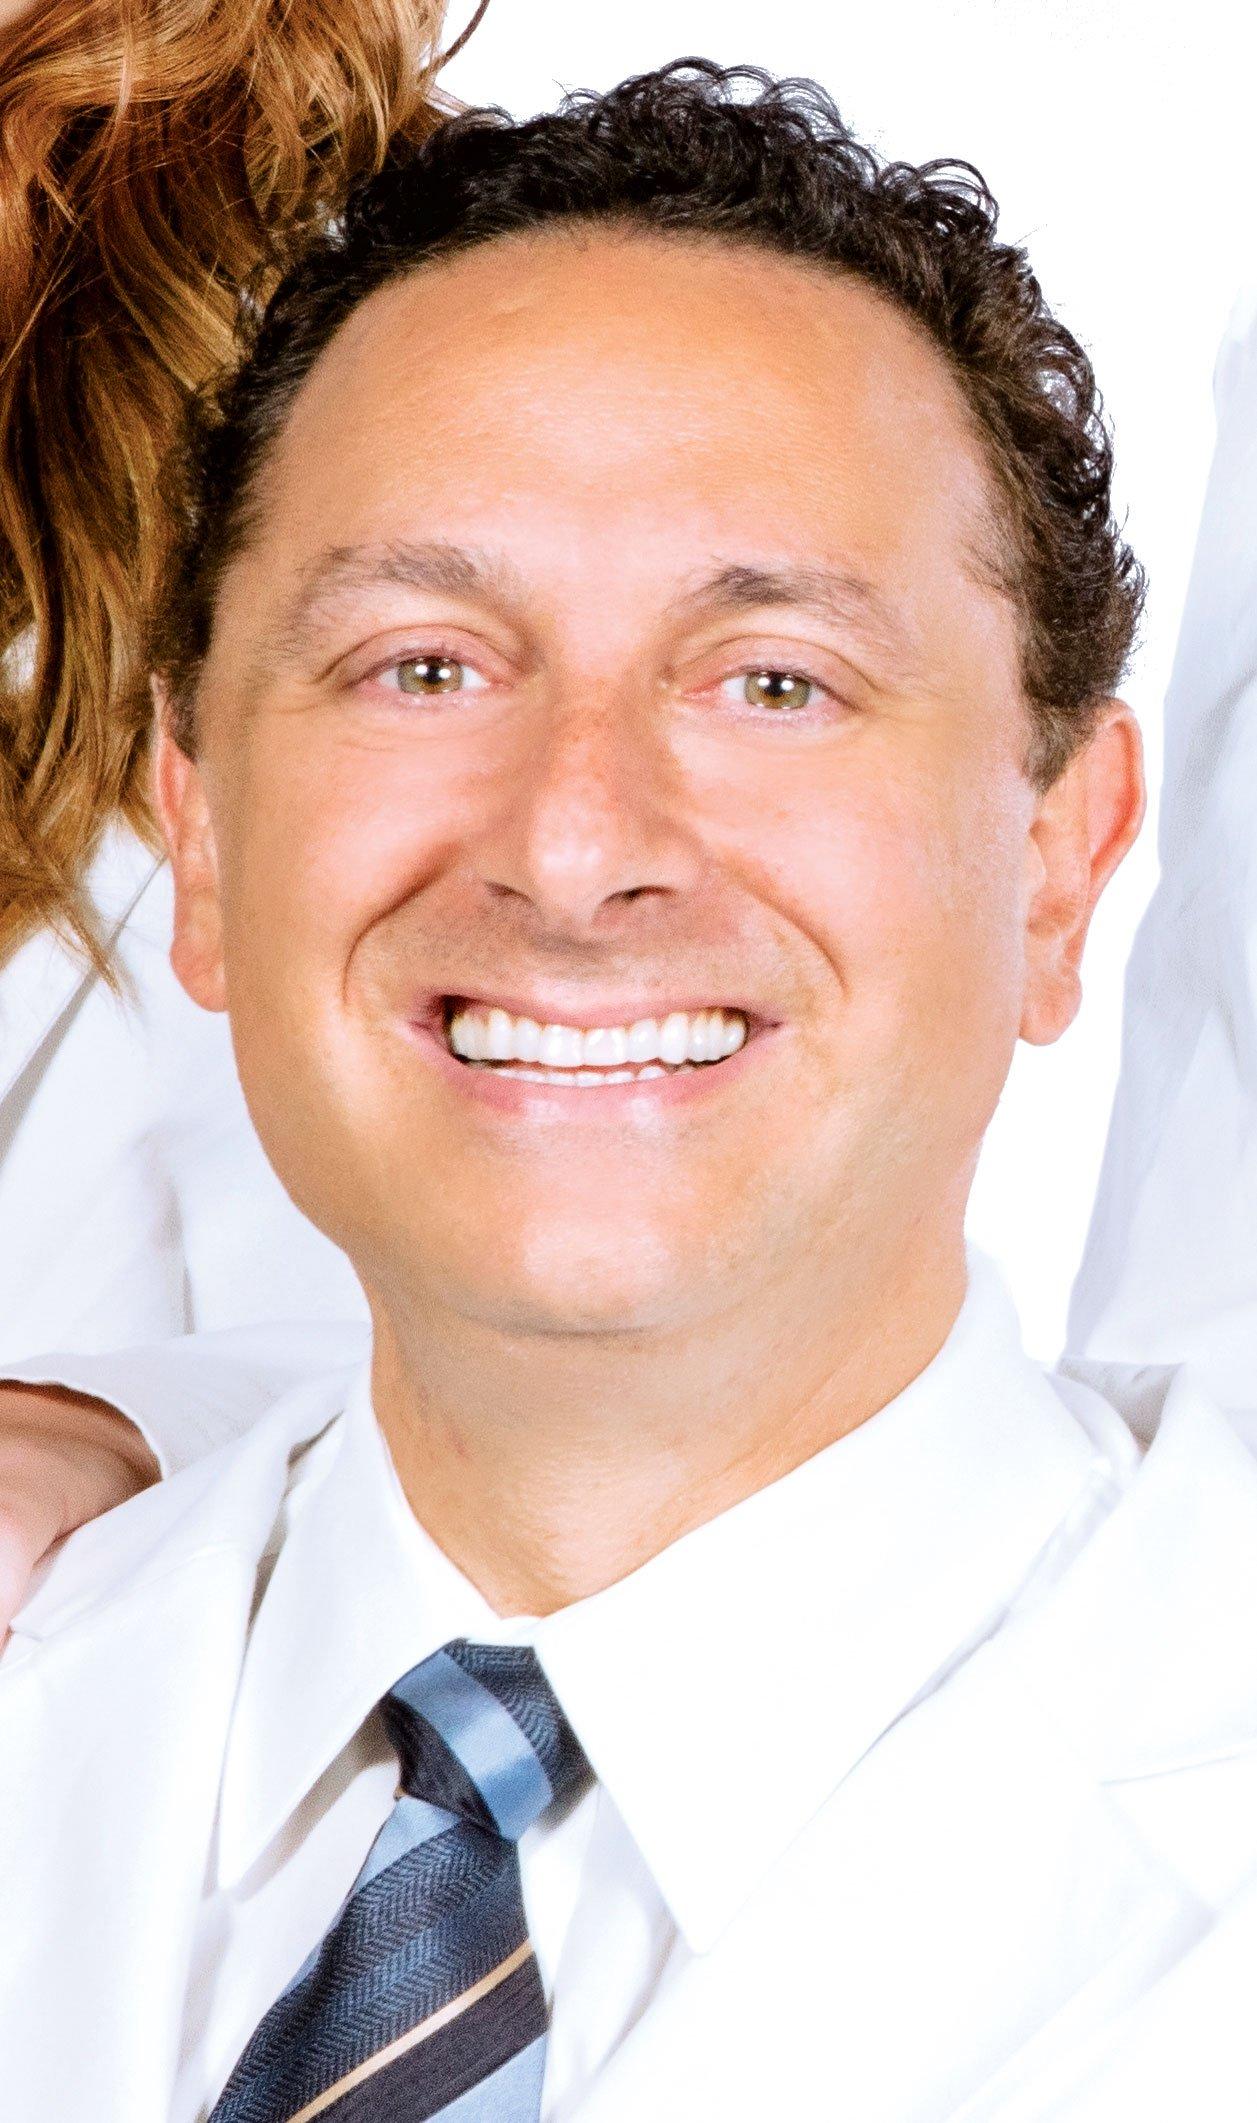 Washington, DC's Very Best Doctors: Inova Fairfax Hospital